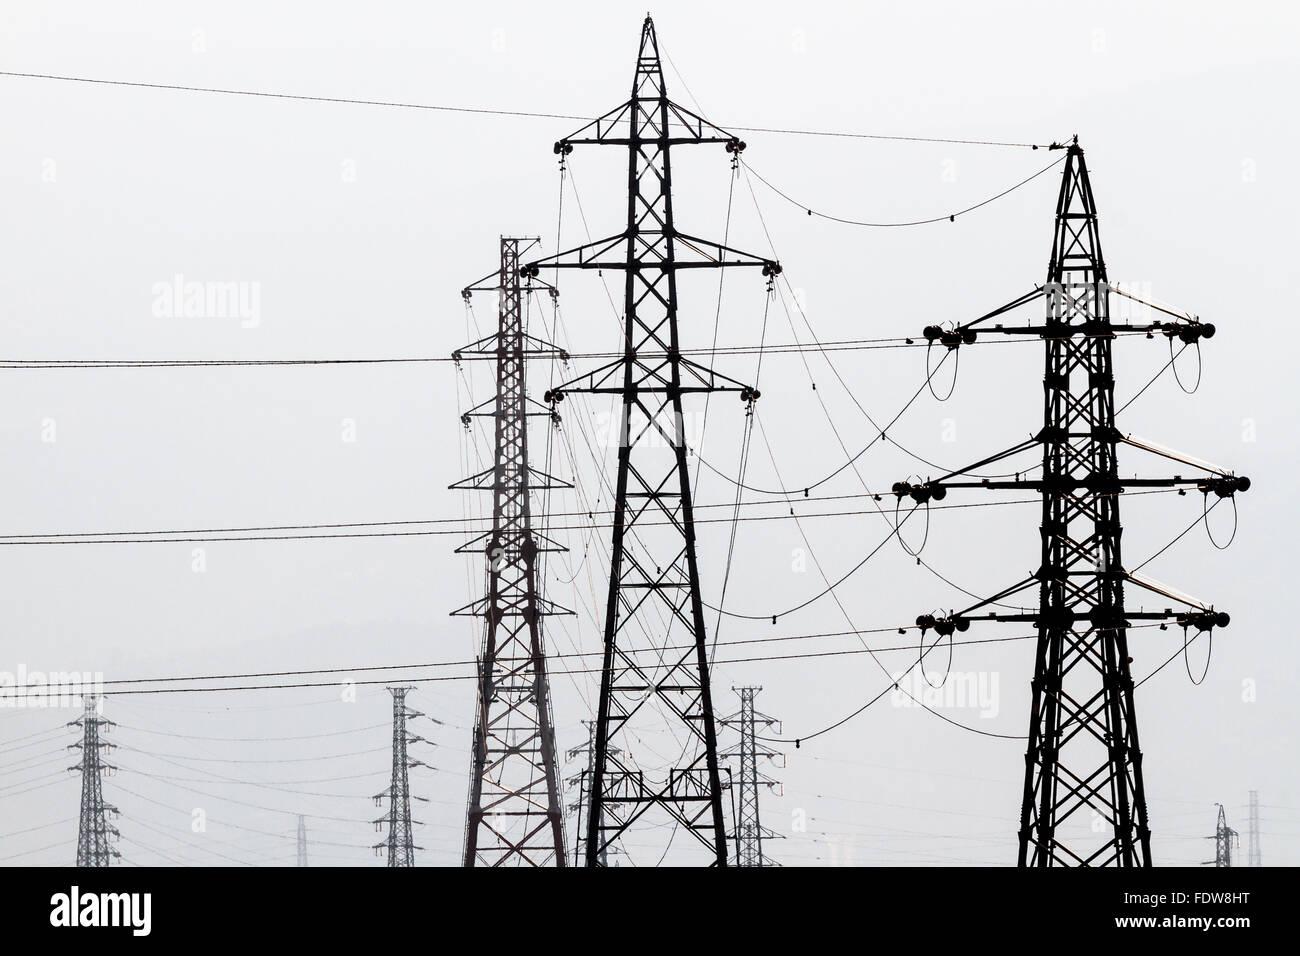 Graphic image of electricity pylons in rural Kanagawa, Japan - Stock Image